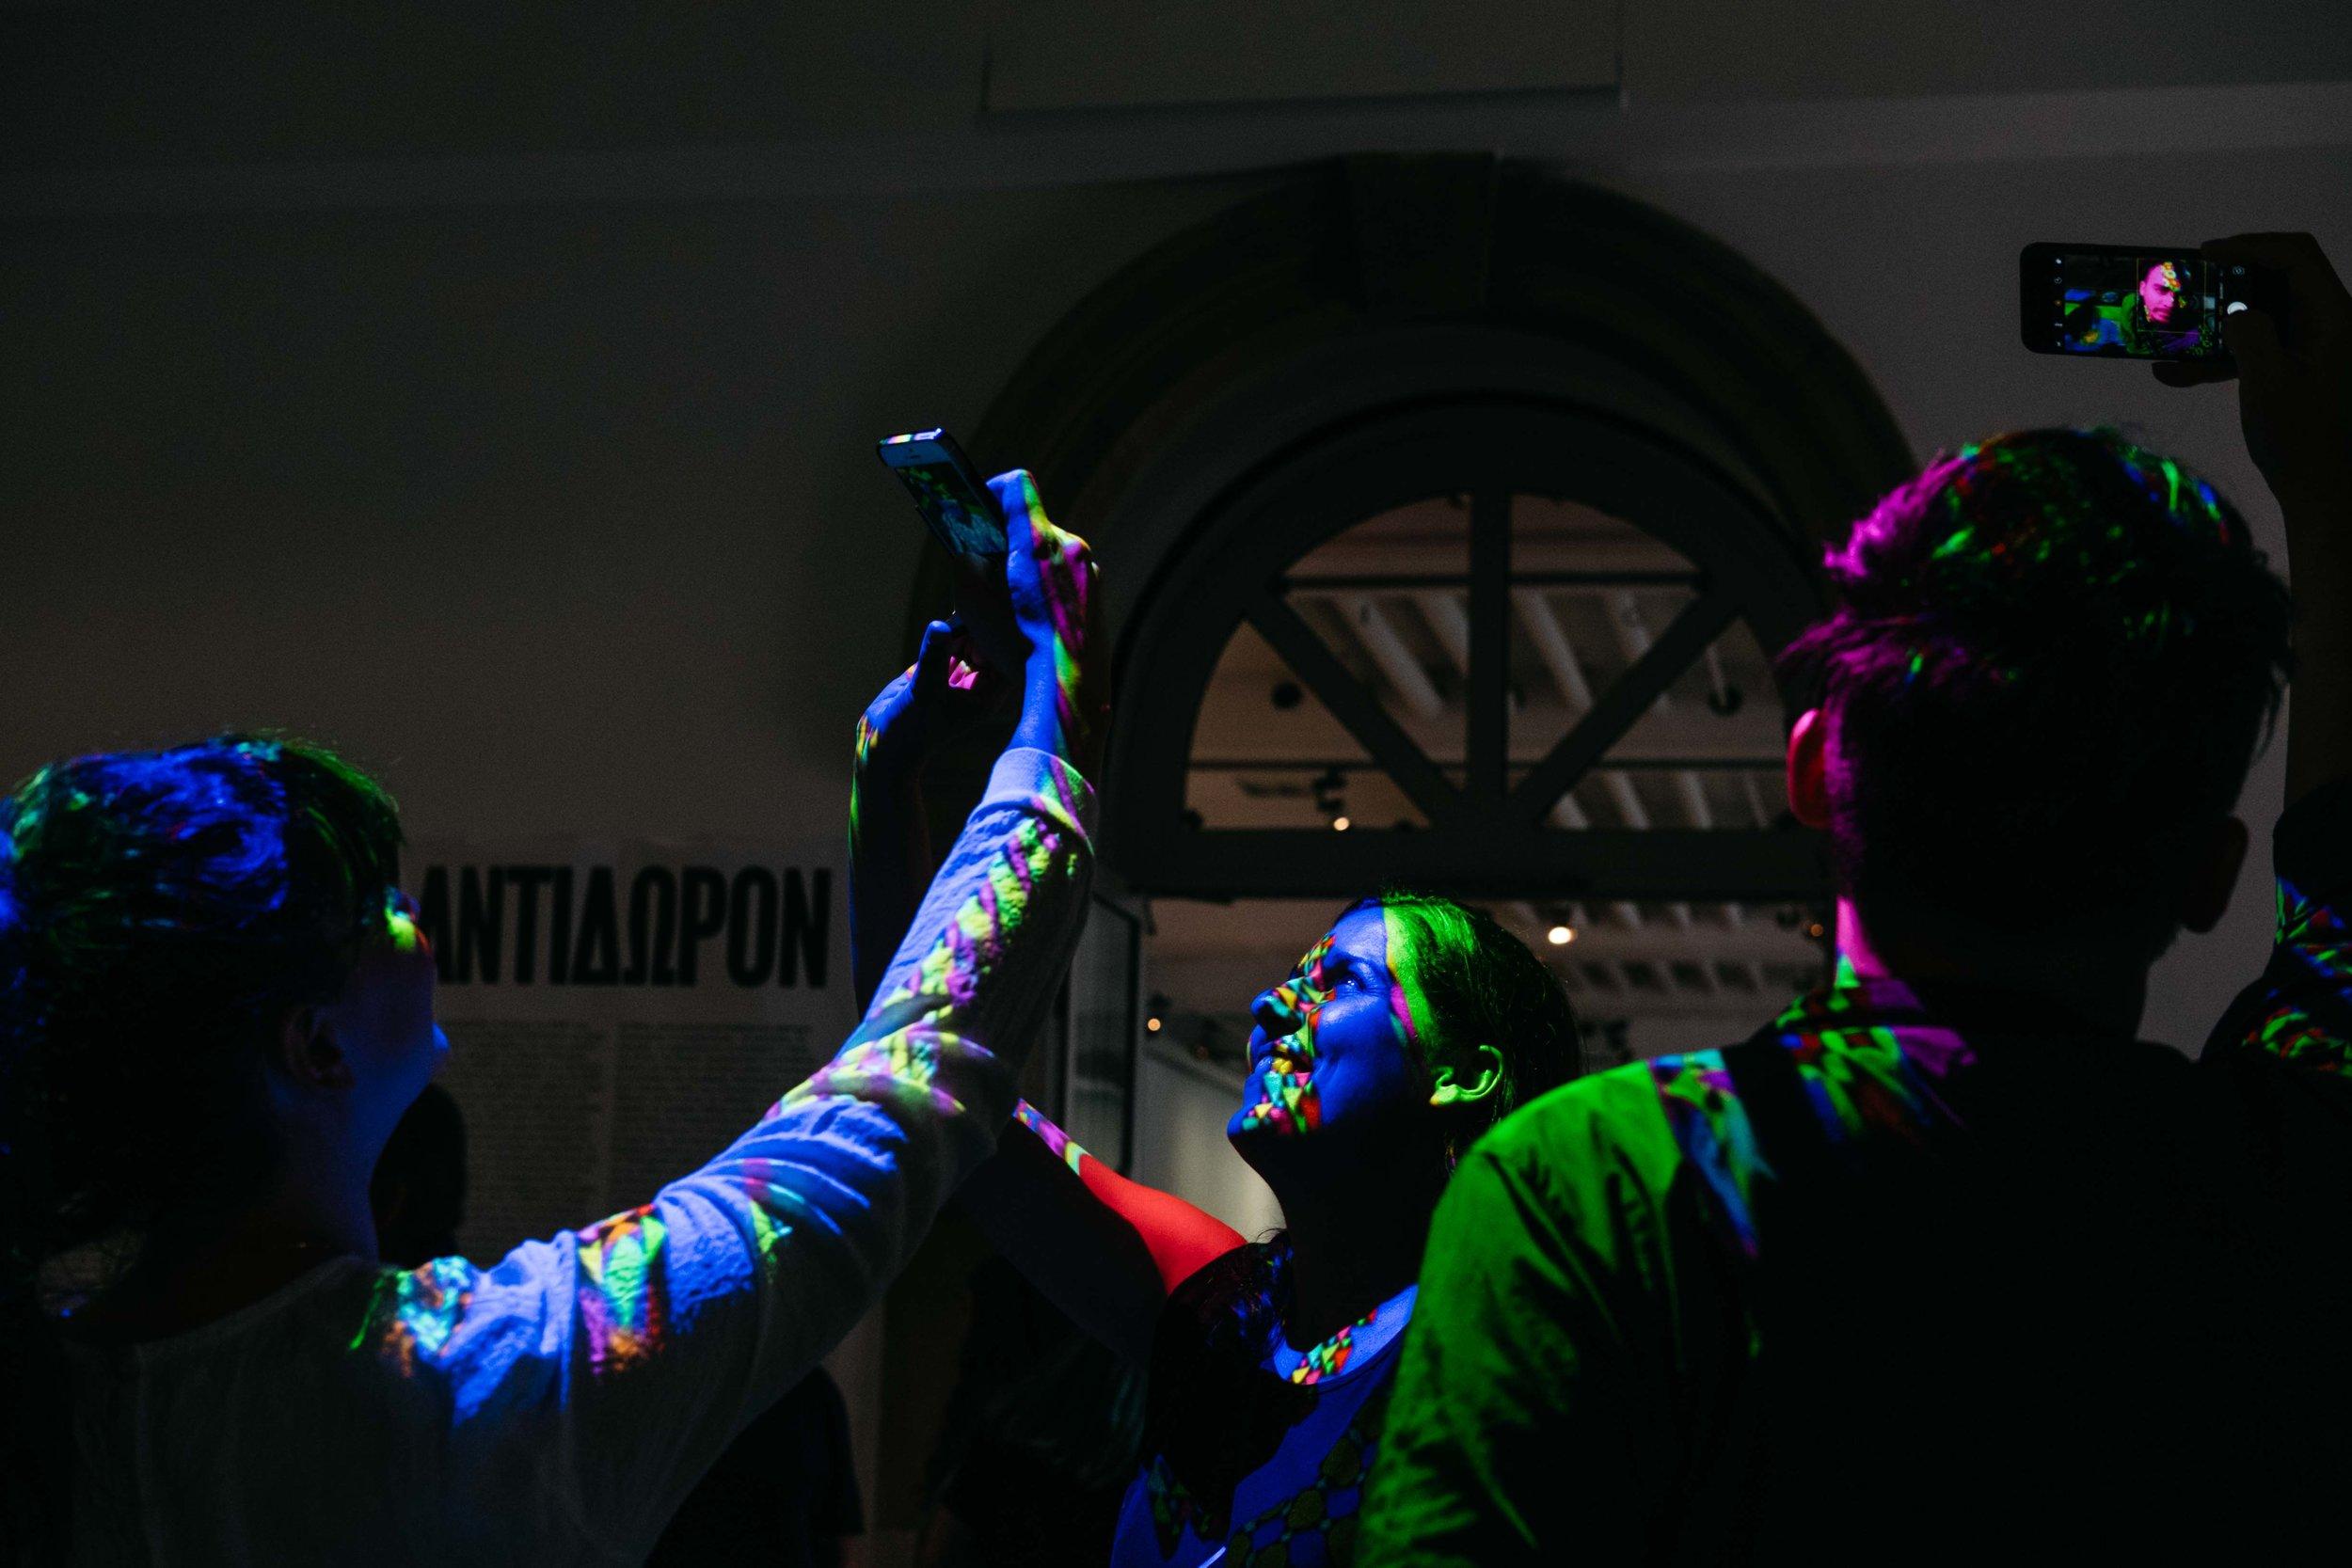 documenta14-kassel-kunst-wearecity-simonhariman-2017-115.jpg